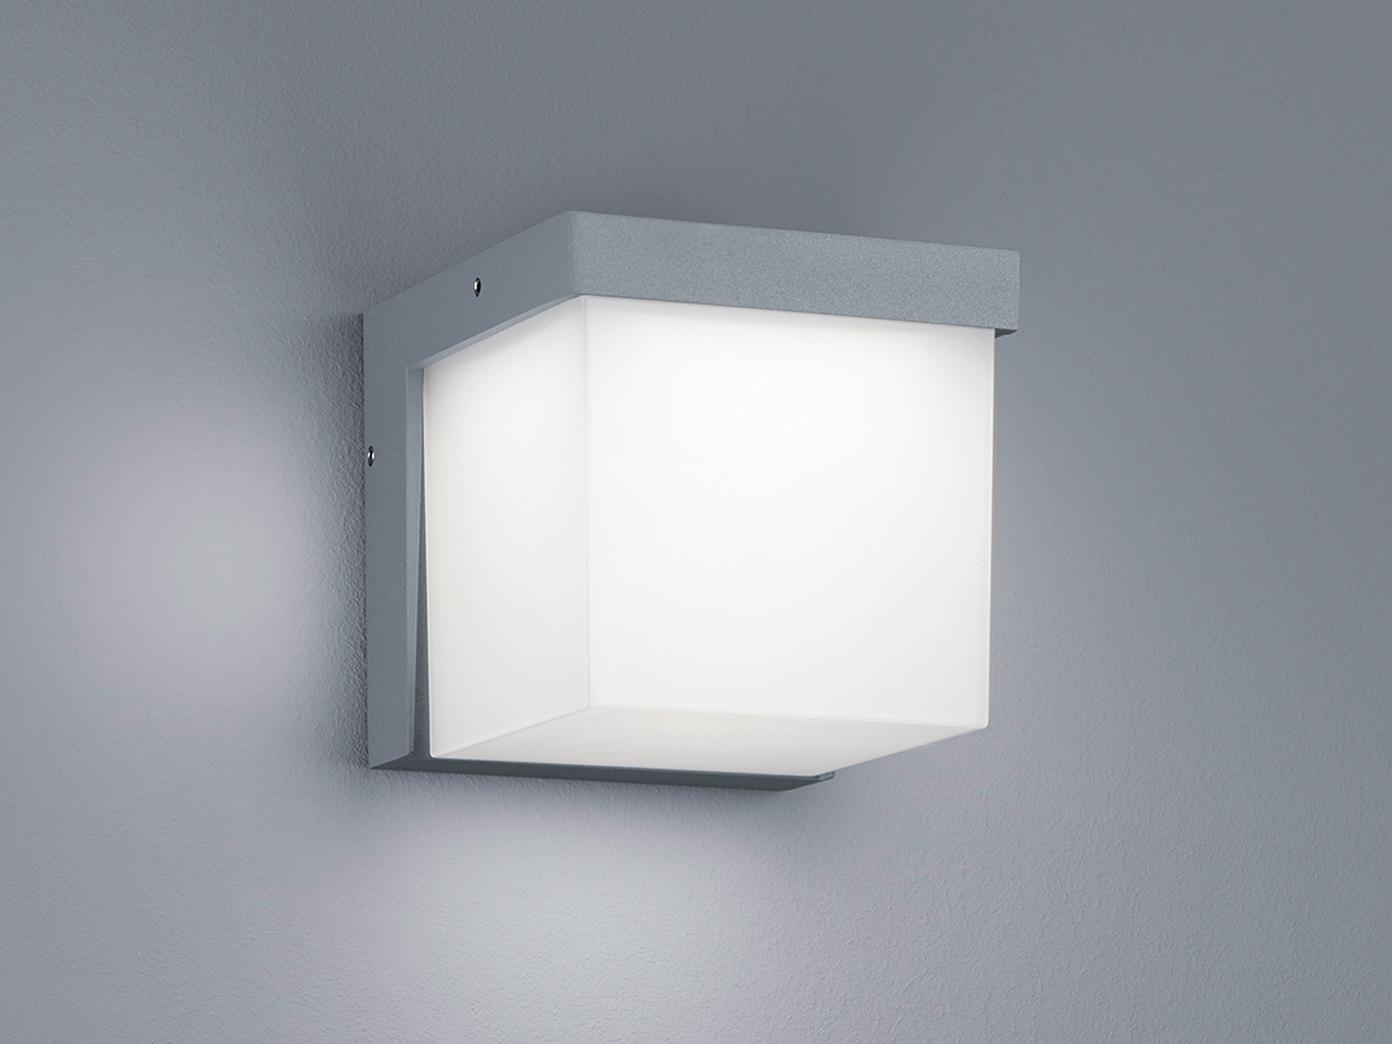 Design led au enleuchte hell grau terrassenbeleuchtung - Terrassenbeleuchtung wand ...